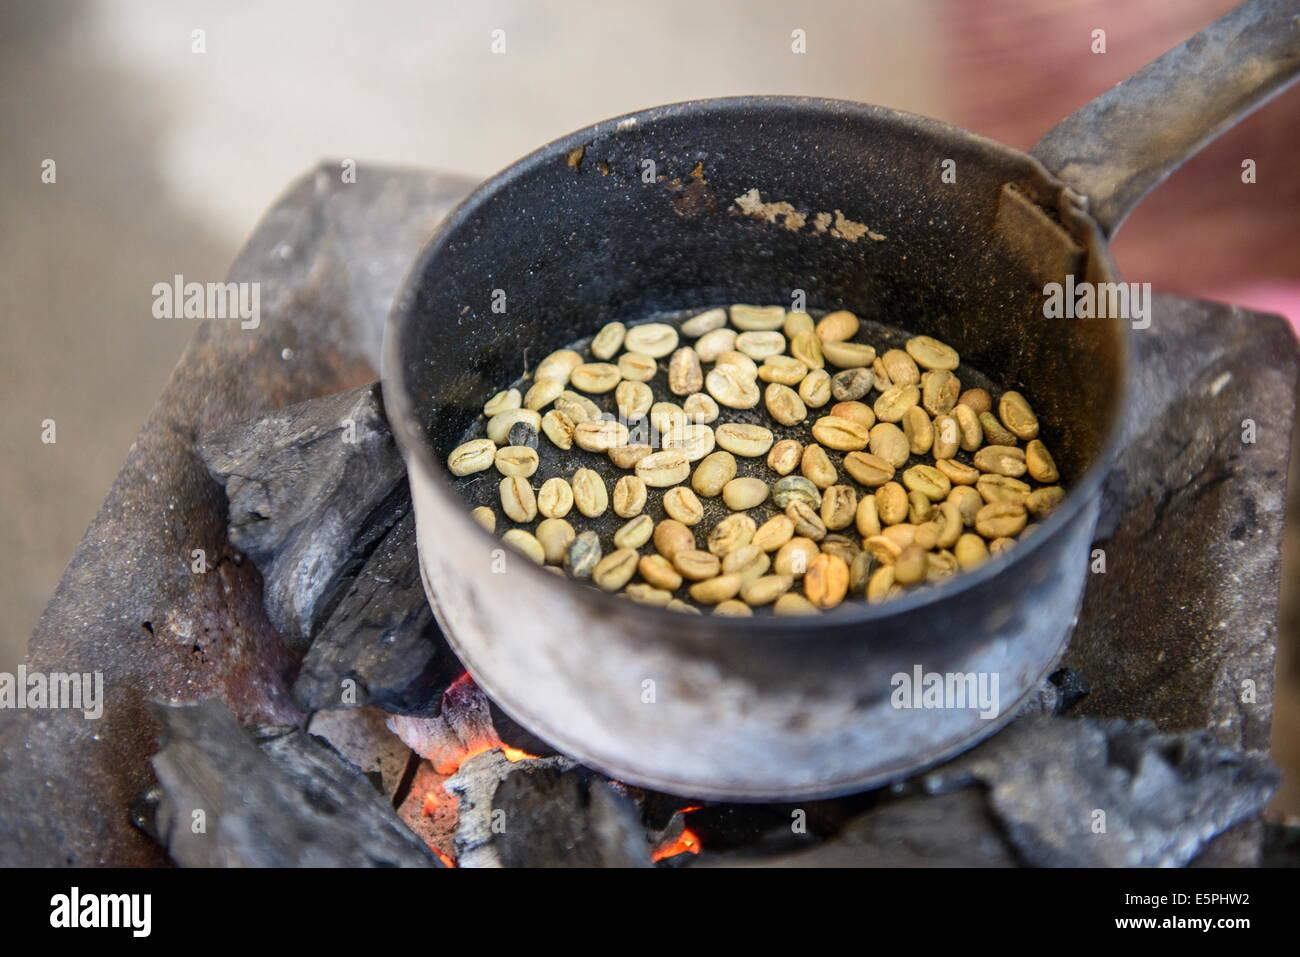 Roasting coffee beans, Keren, Eritrea, Africa - Stock Image